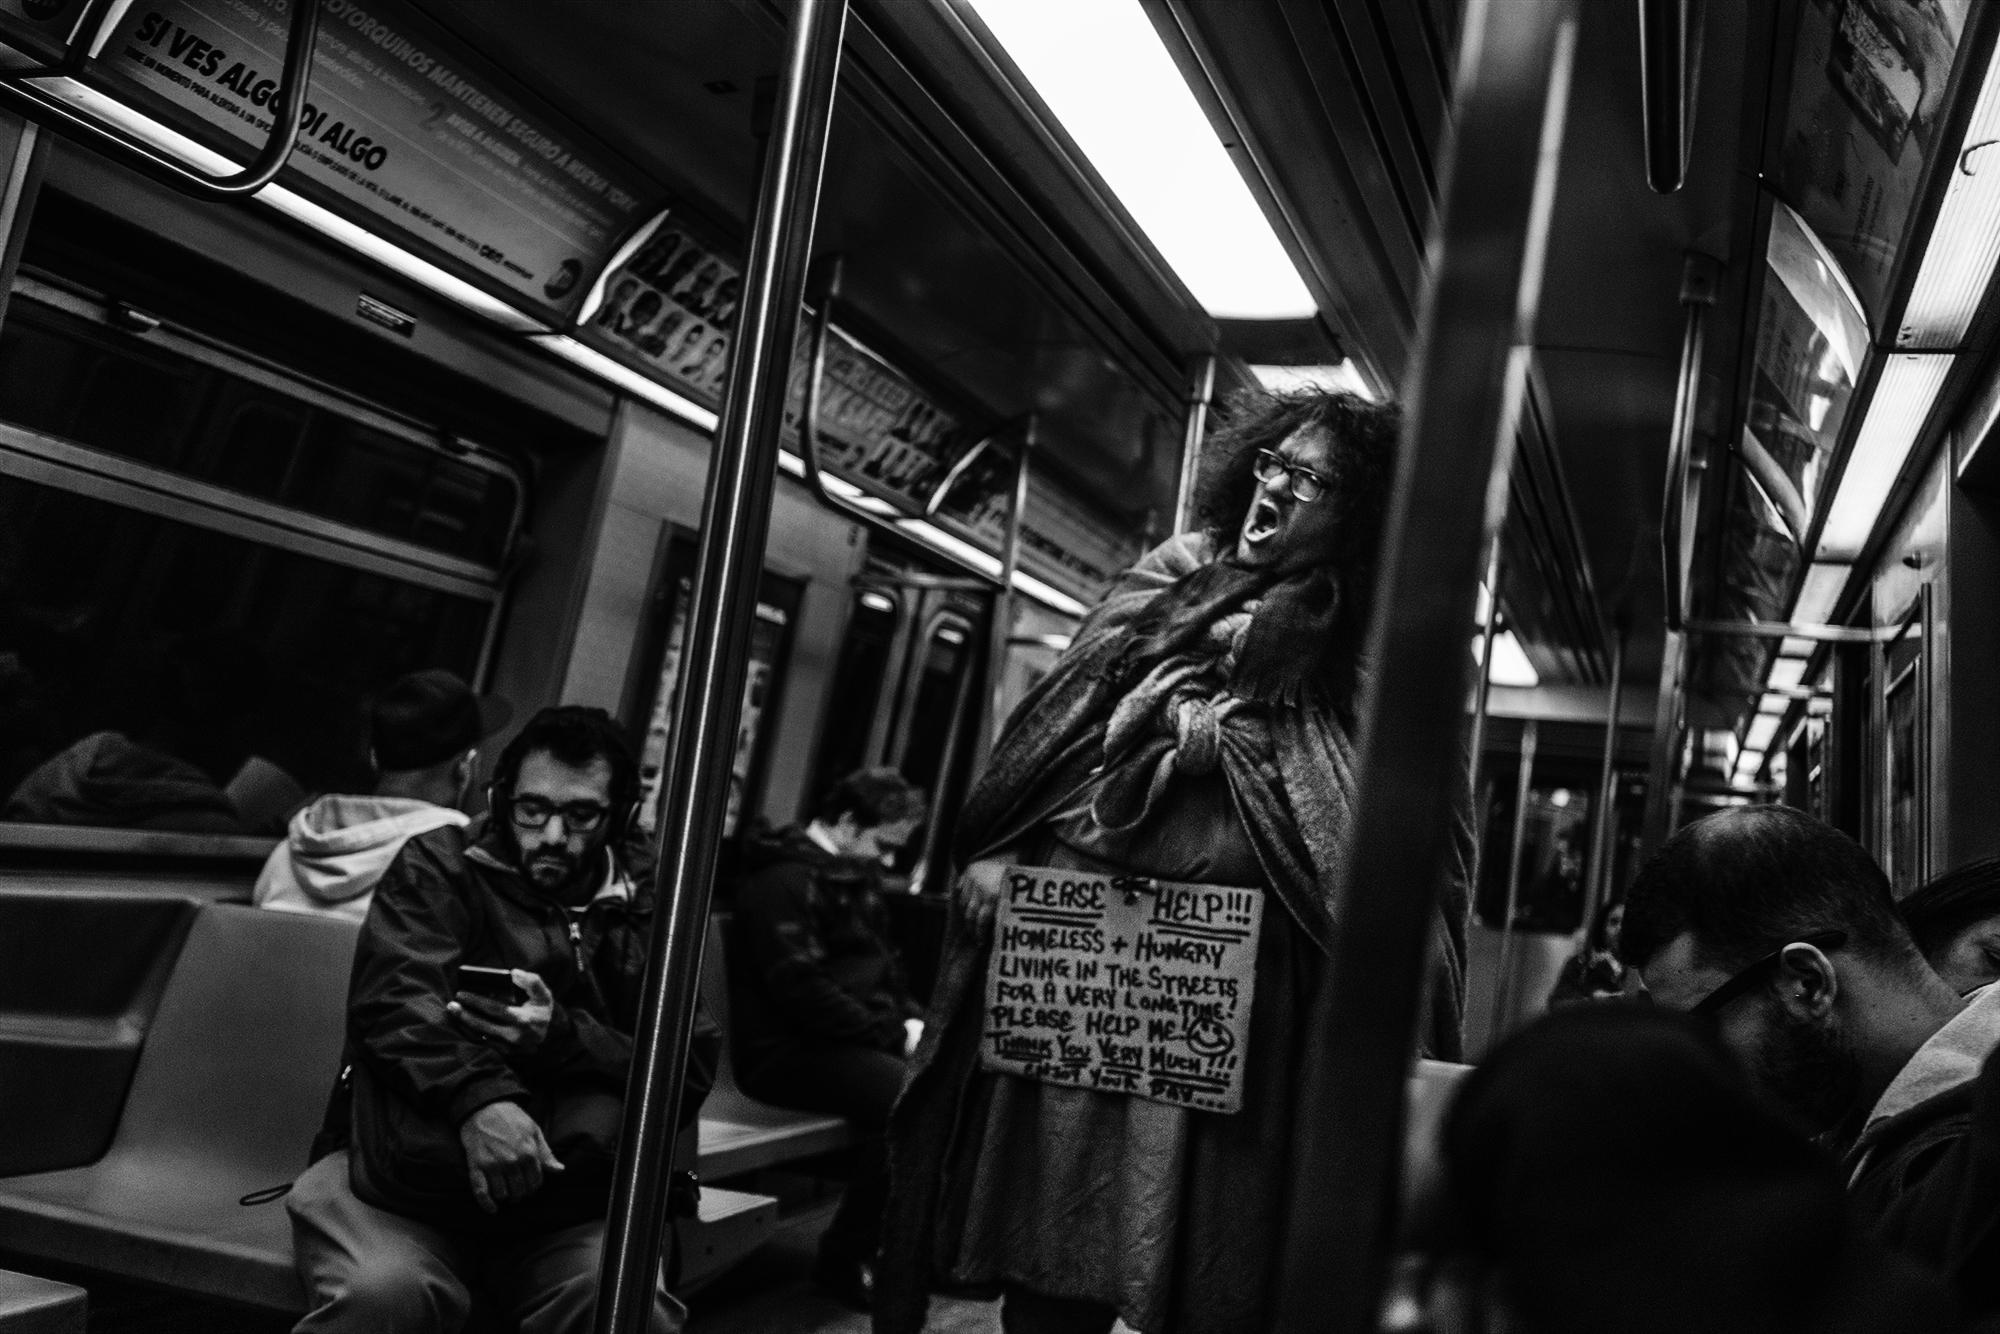 NYC_Subway_Homeless_Man_Oger_2017-001.jpg